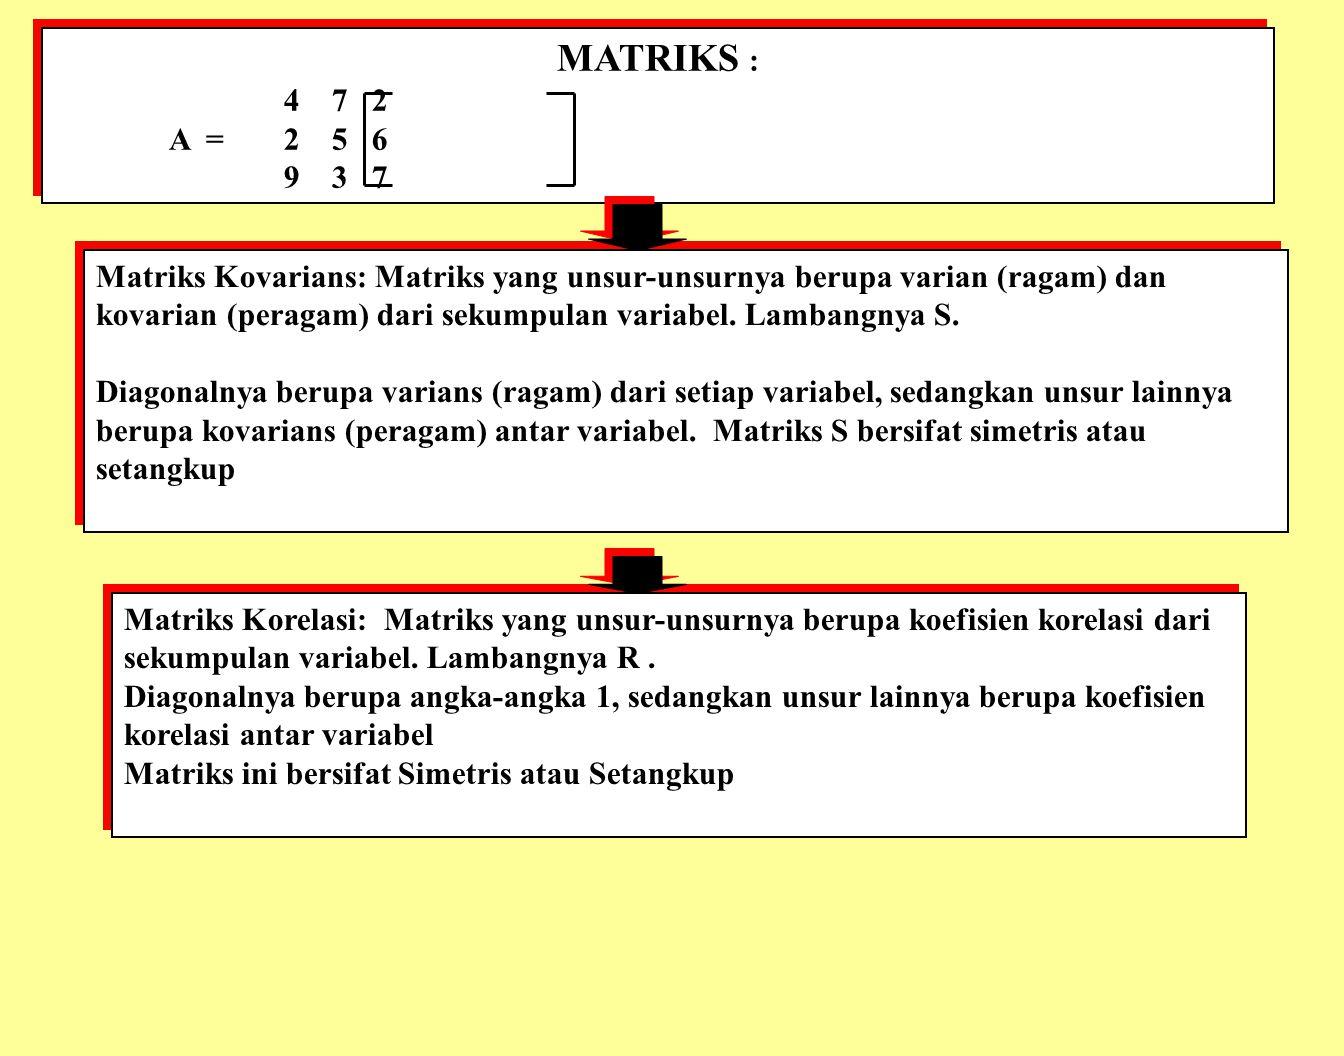 MATRIKS : 4 7 2. A = 2 5 6. 9 3 7.